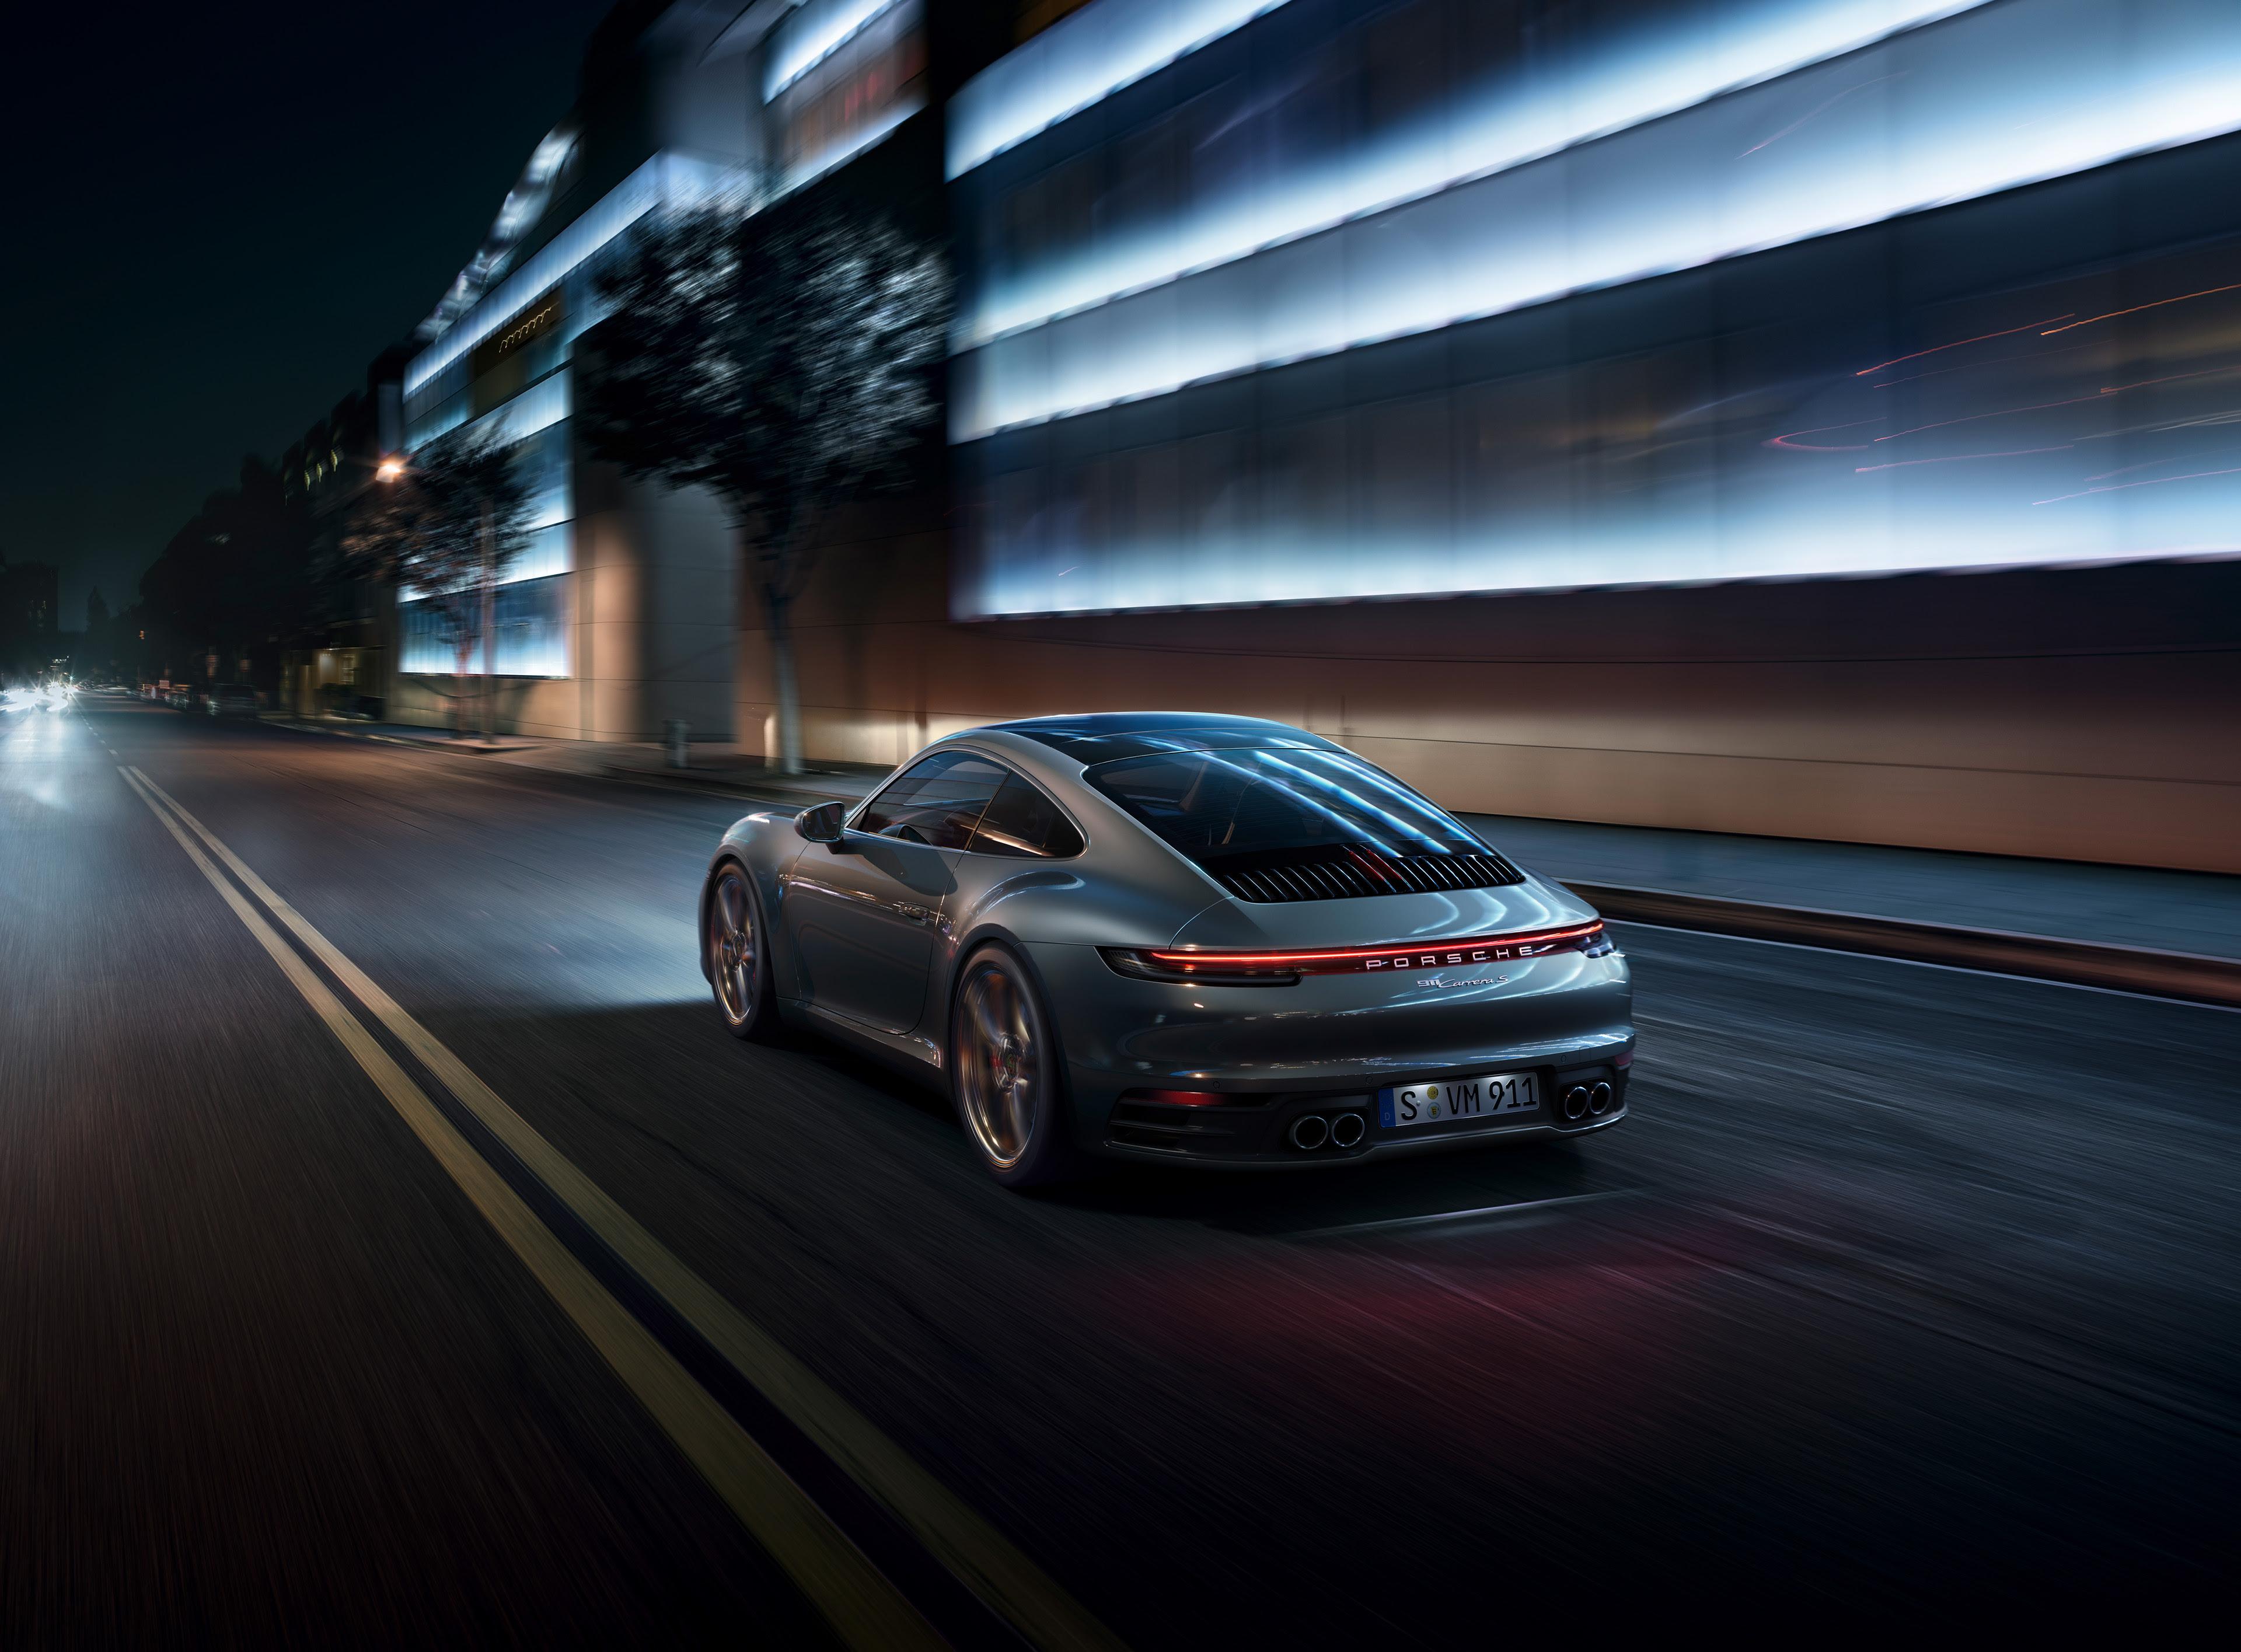 Porsche 911 Rear 4k, HD Cars, 4k Wallpapers, Images ...